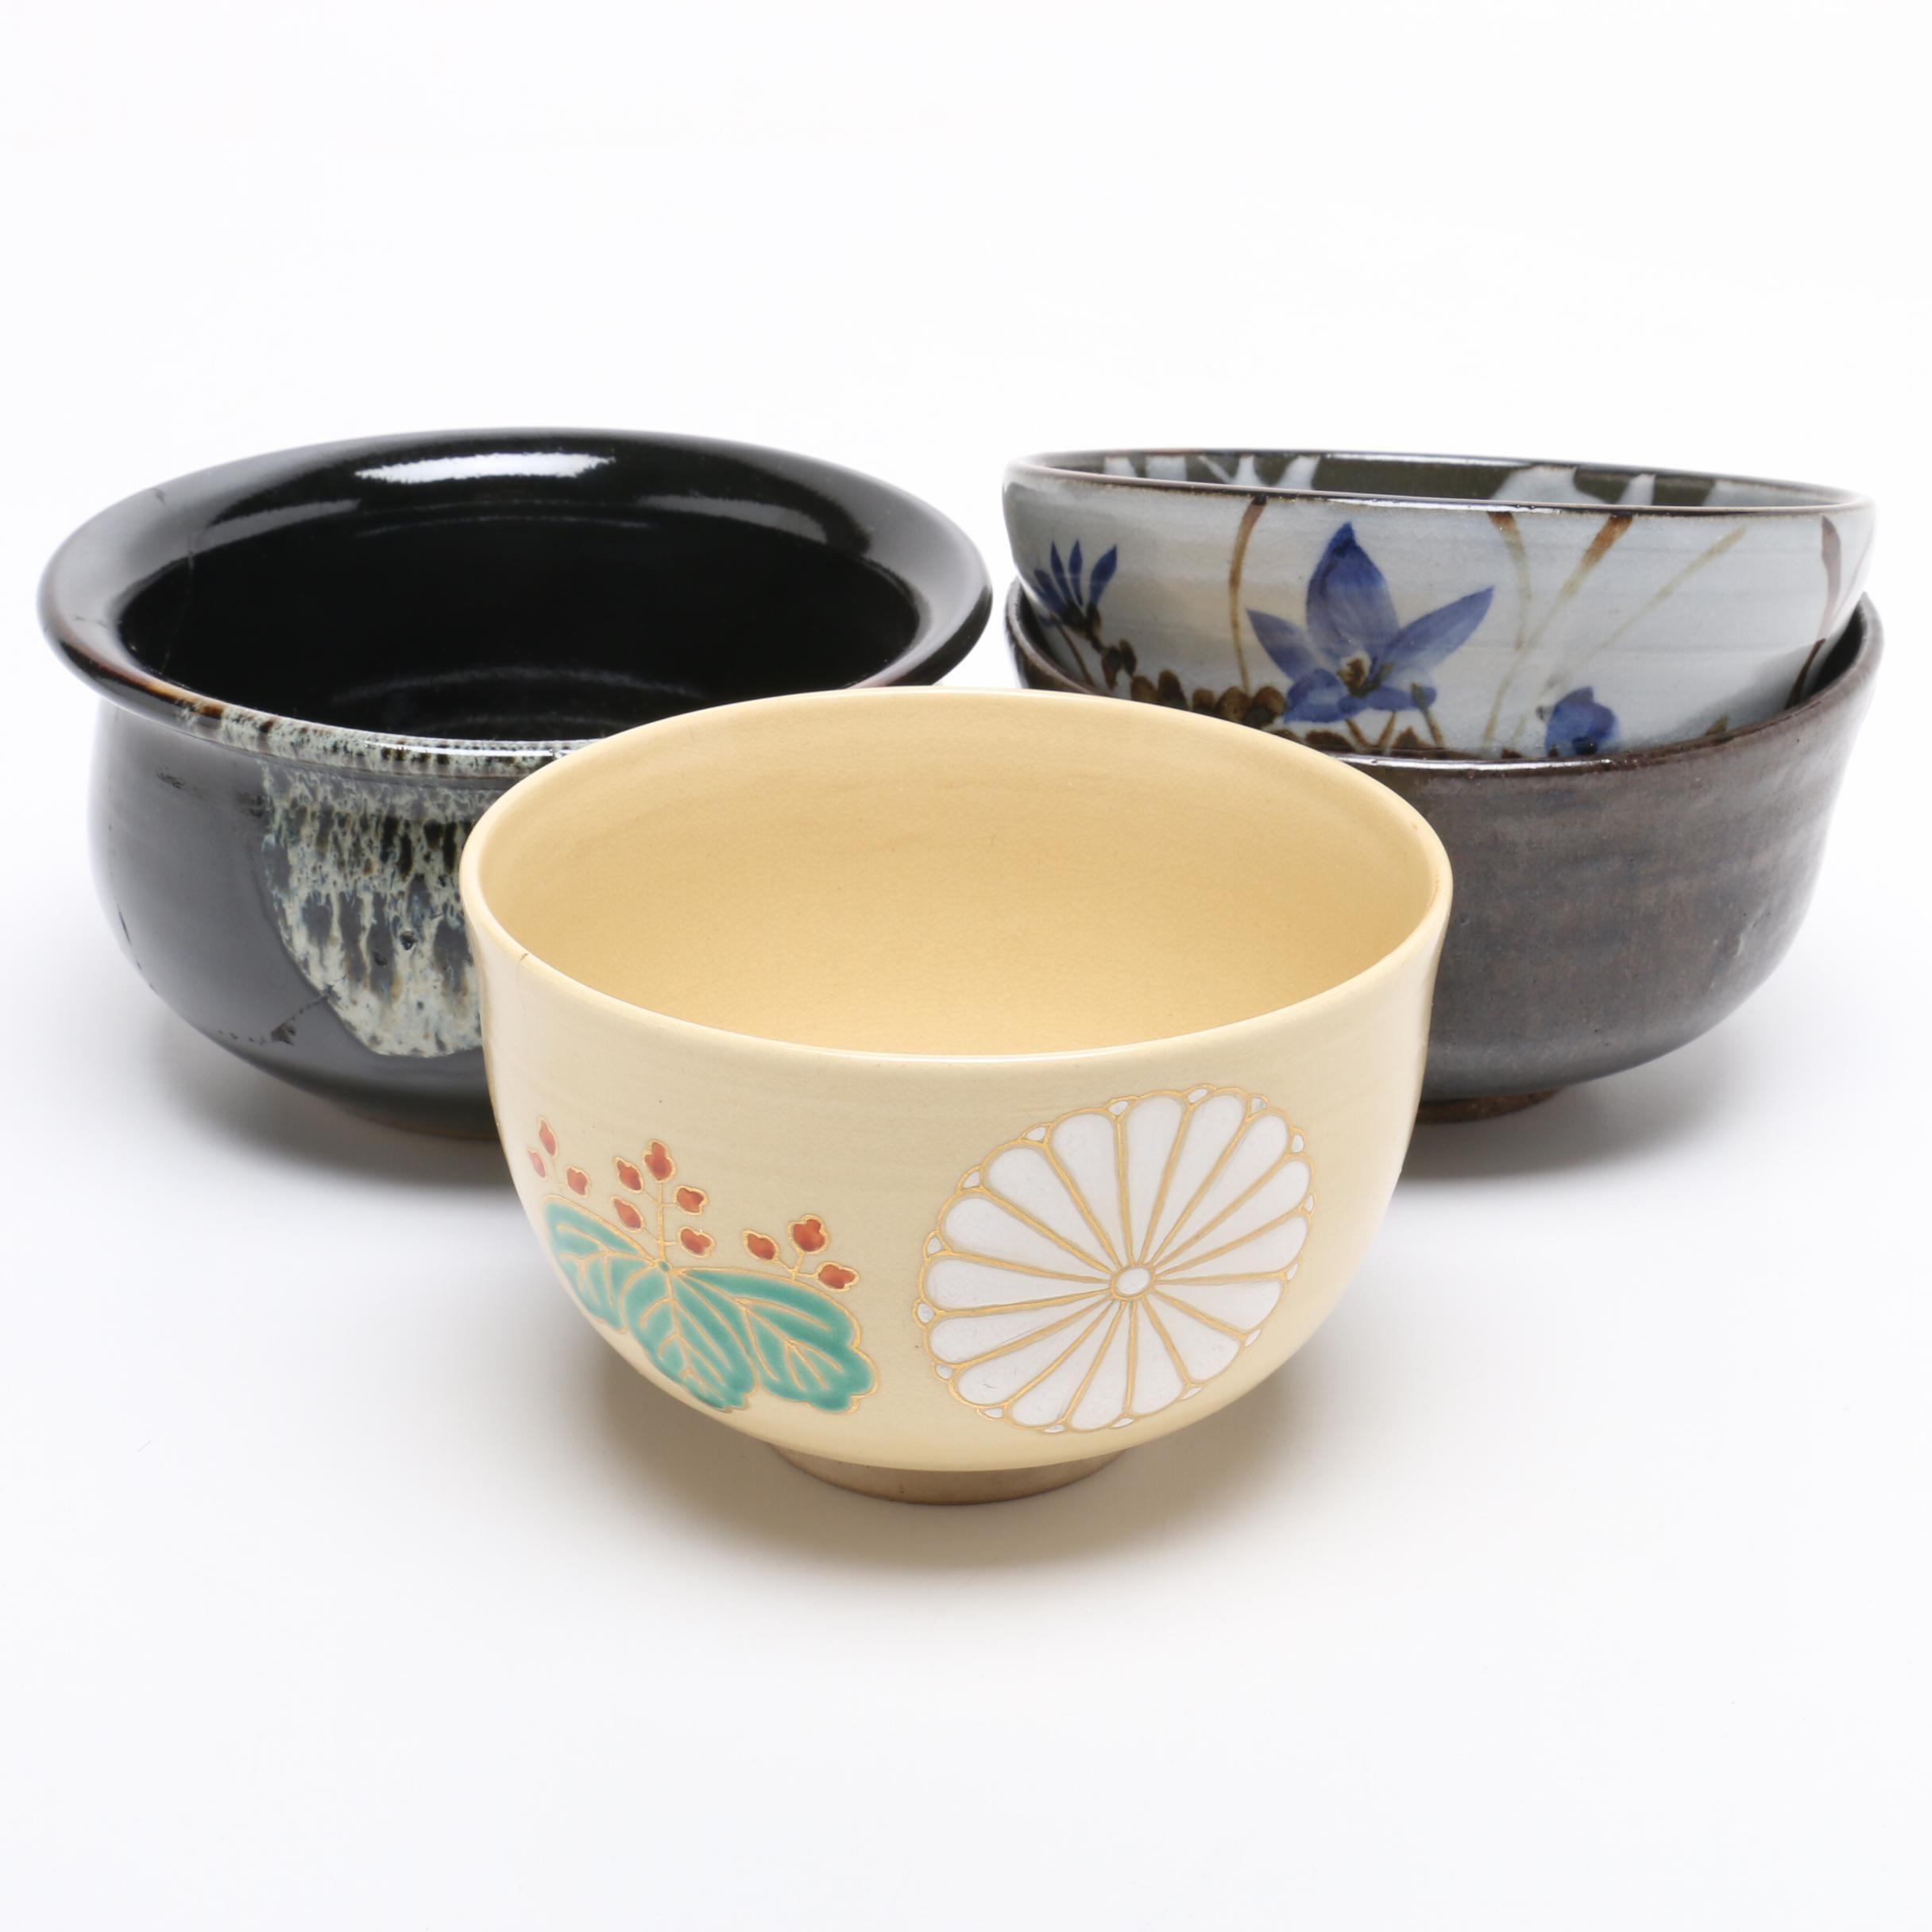 Japanese Ceramic Studio Pottery Tea Bowls